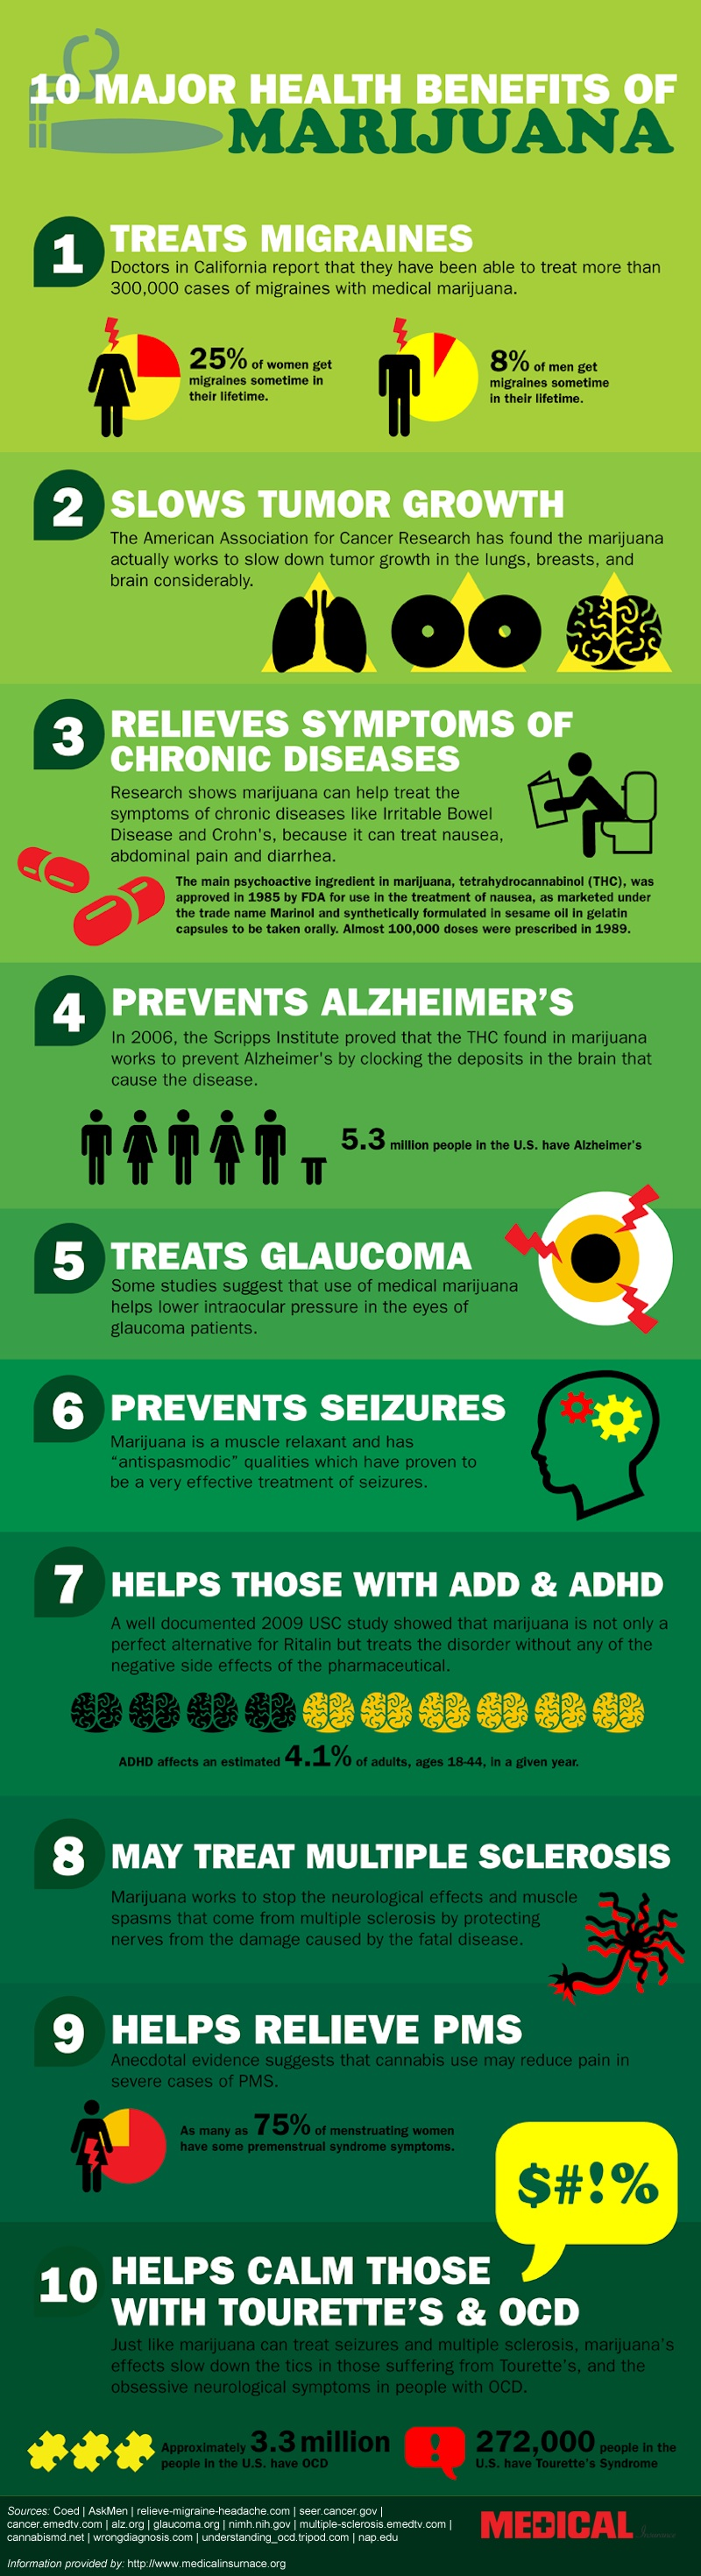 10 major health benefits from cannabis